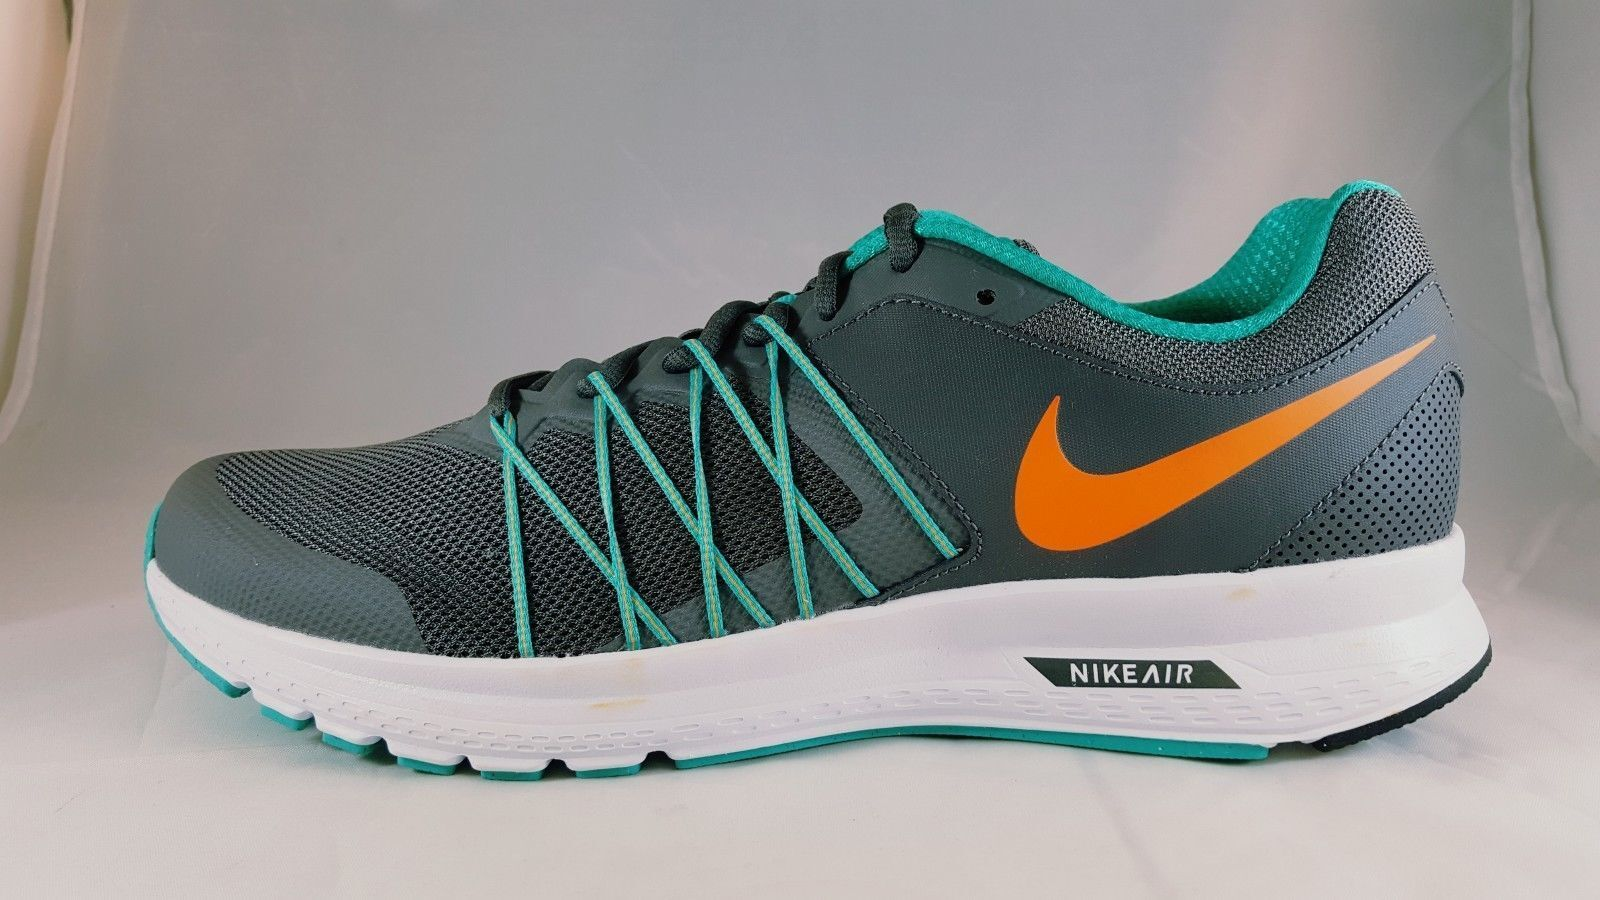 Nike air implacabile 6 uomini e scarpe misura da ginnastica 843836 002 misura scarpe 7,5 be3b37